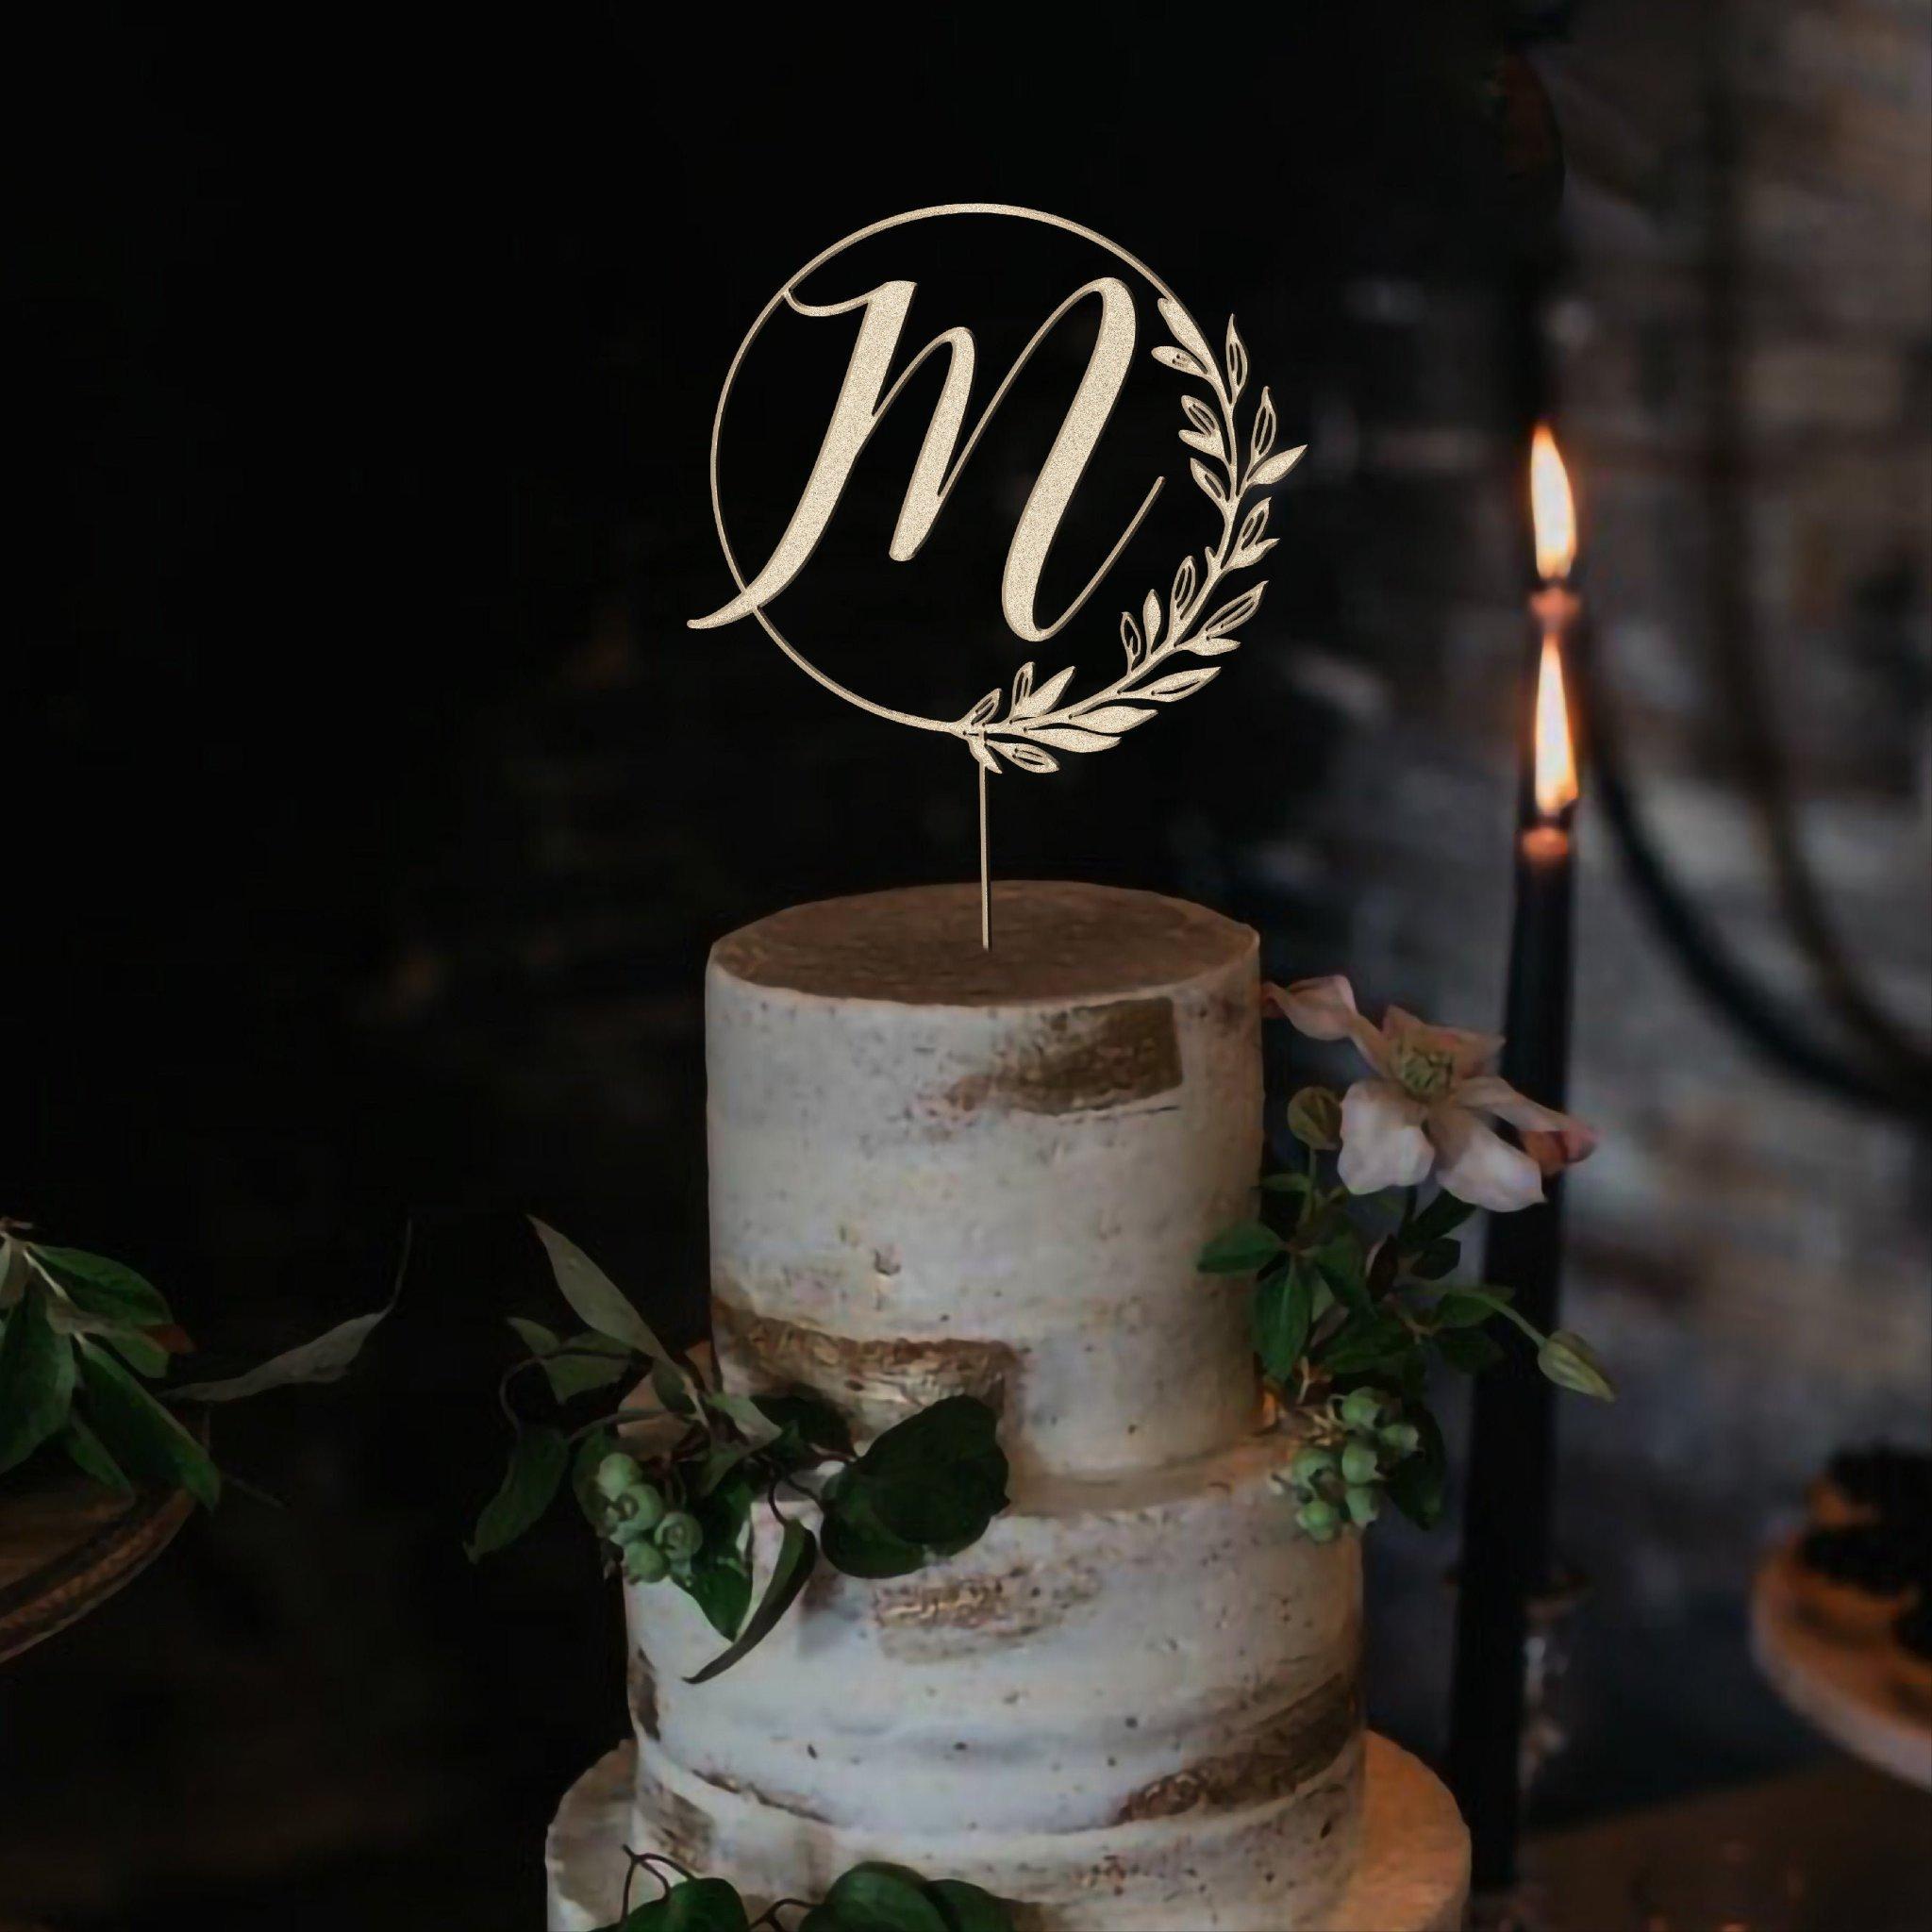 Hand-painted monogram cake topper